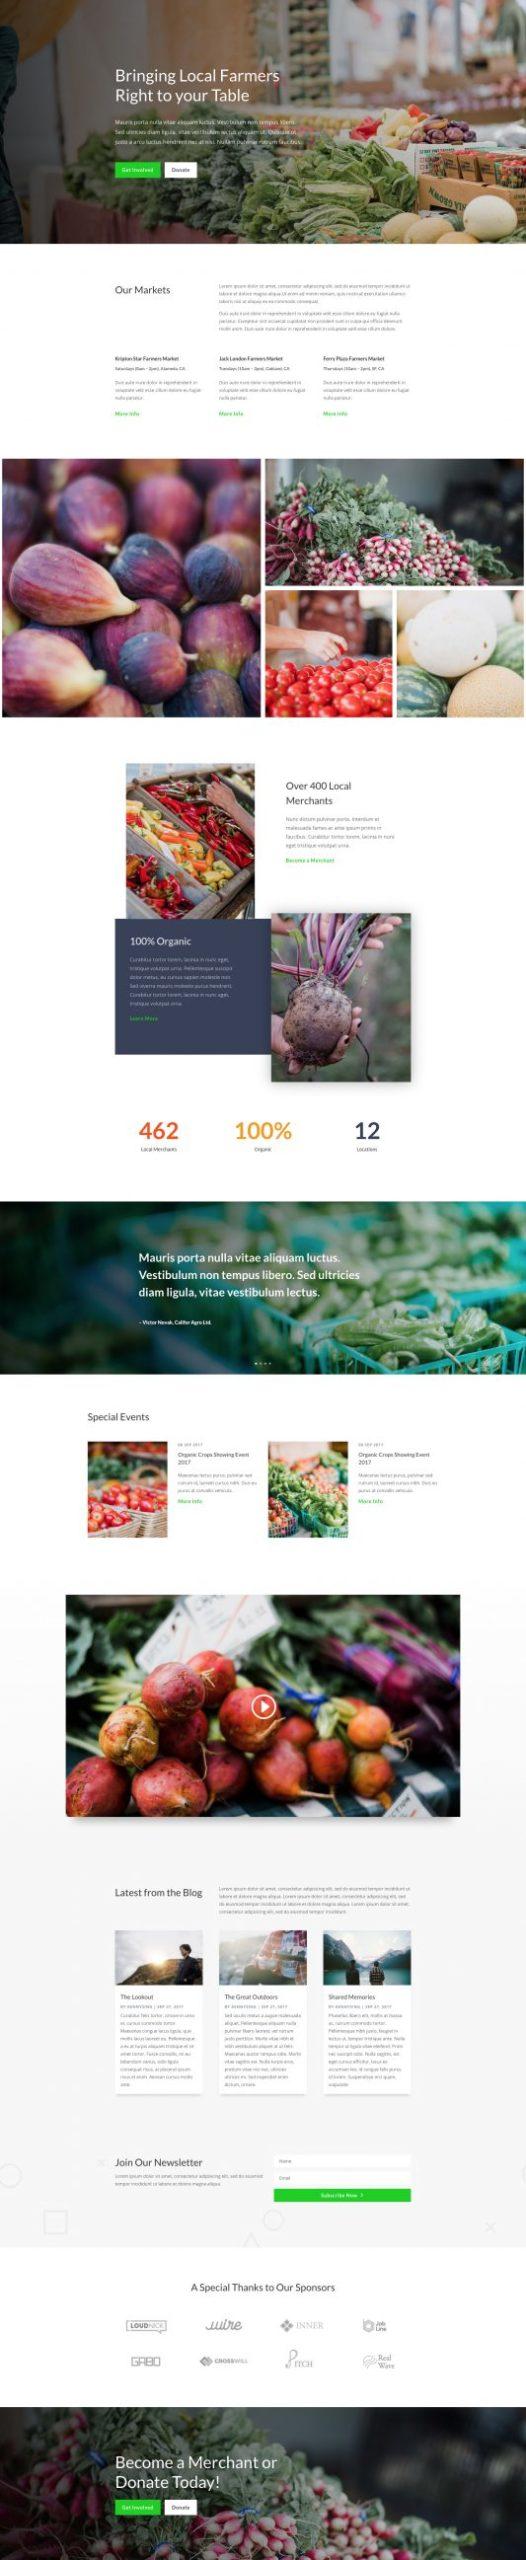 Farmers Market Landing Page